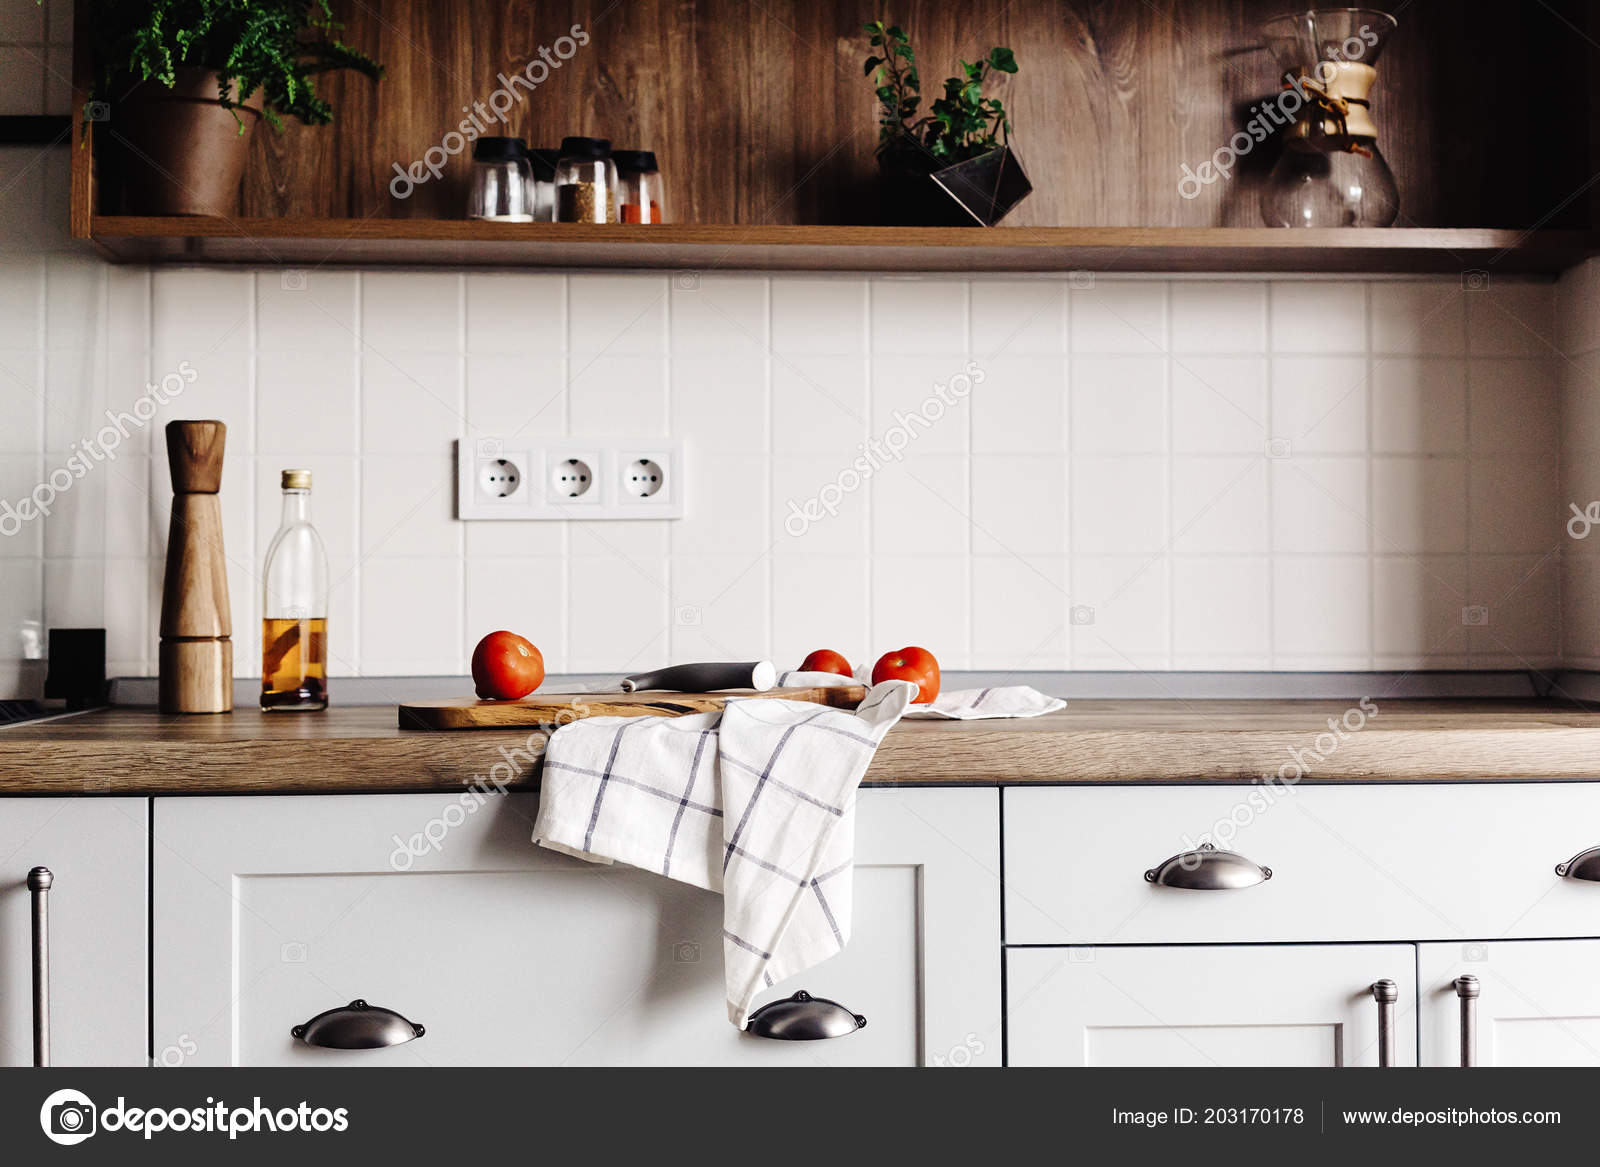 Deska Nożem Pomidory Oliwy Oliwek Nowoczesnej Kuchni Blat